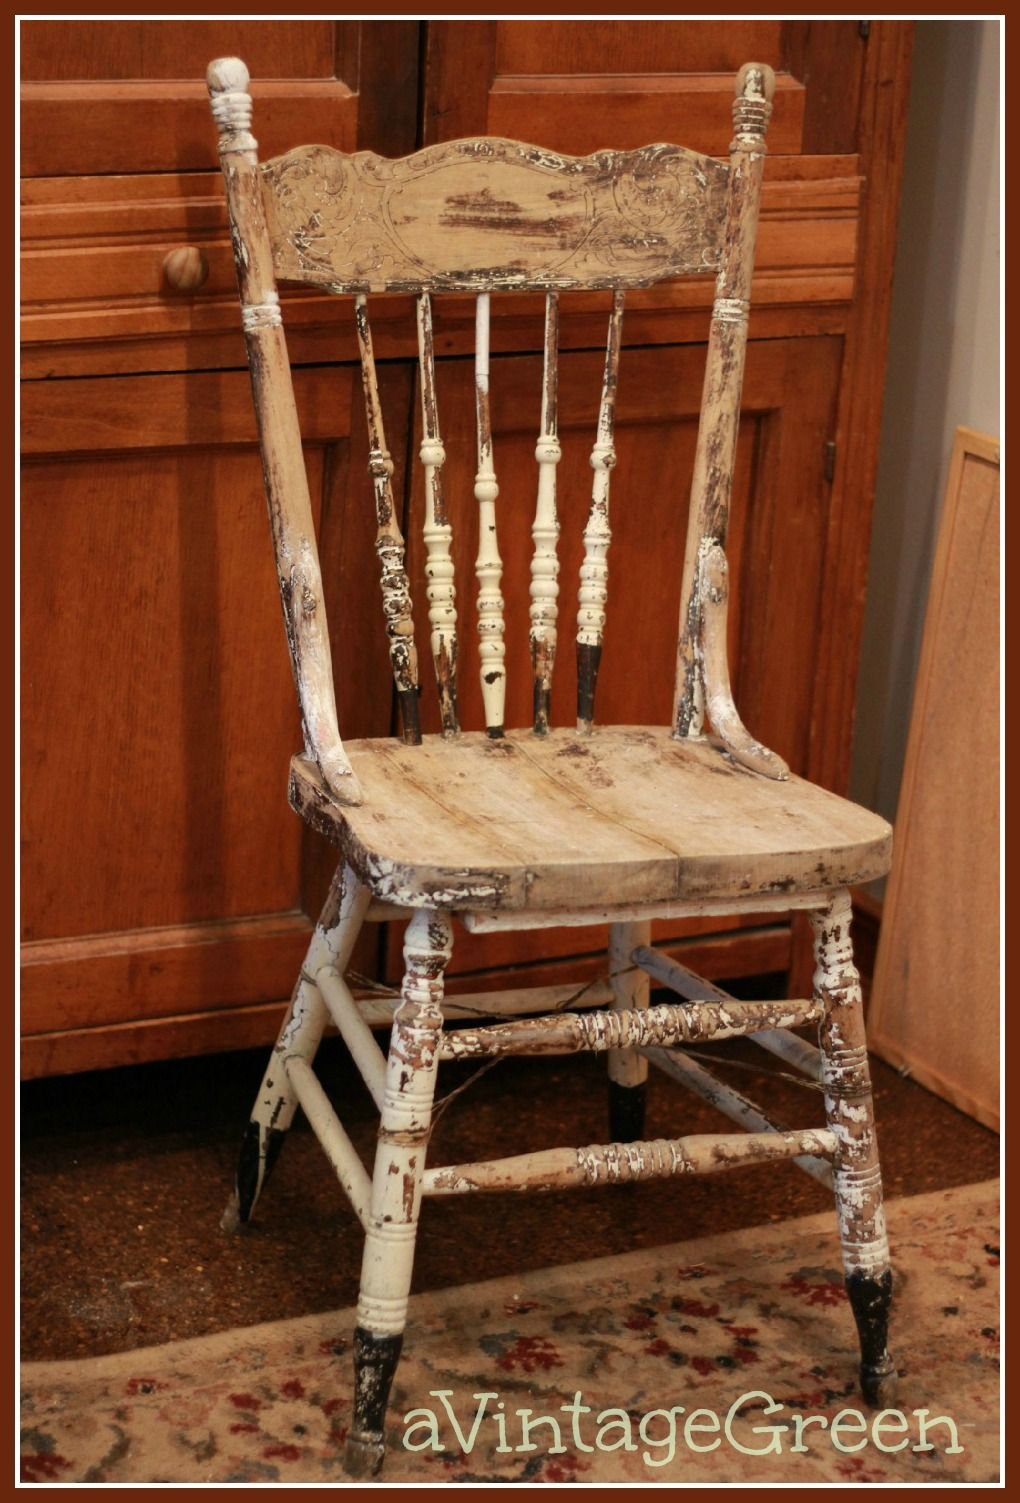 Old wooden chair styles - Old Wooden Chair Styles 1